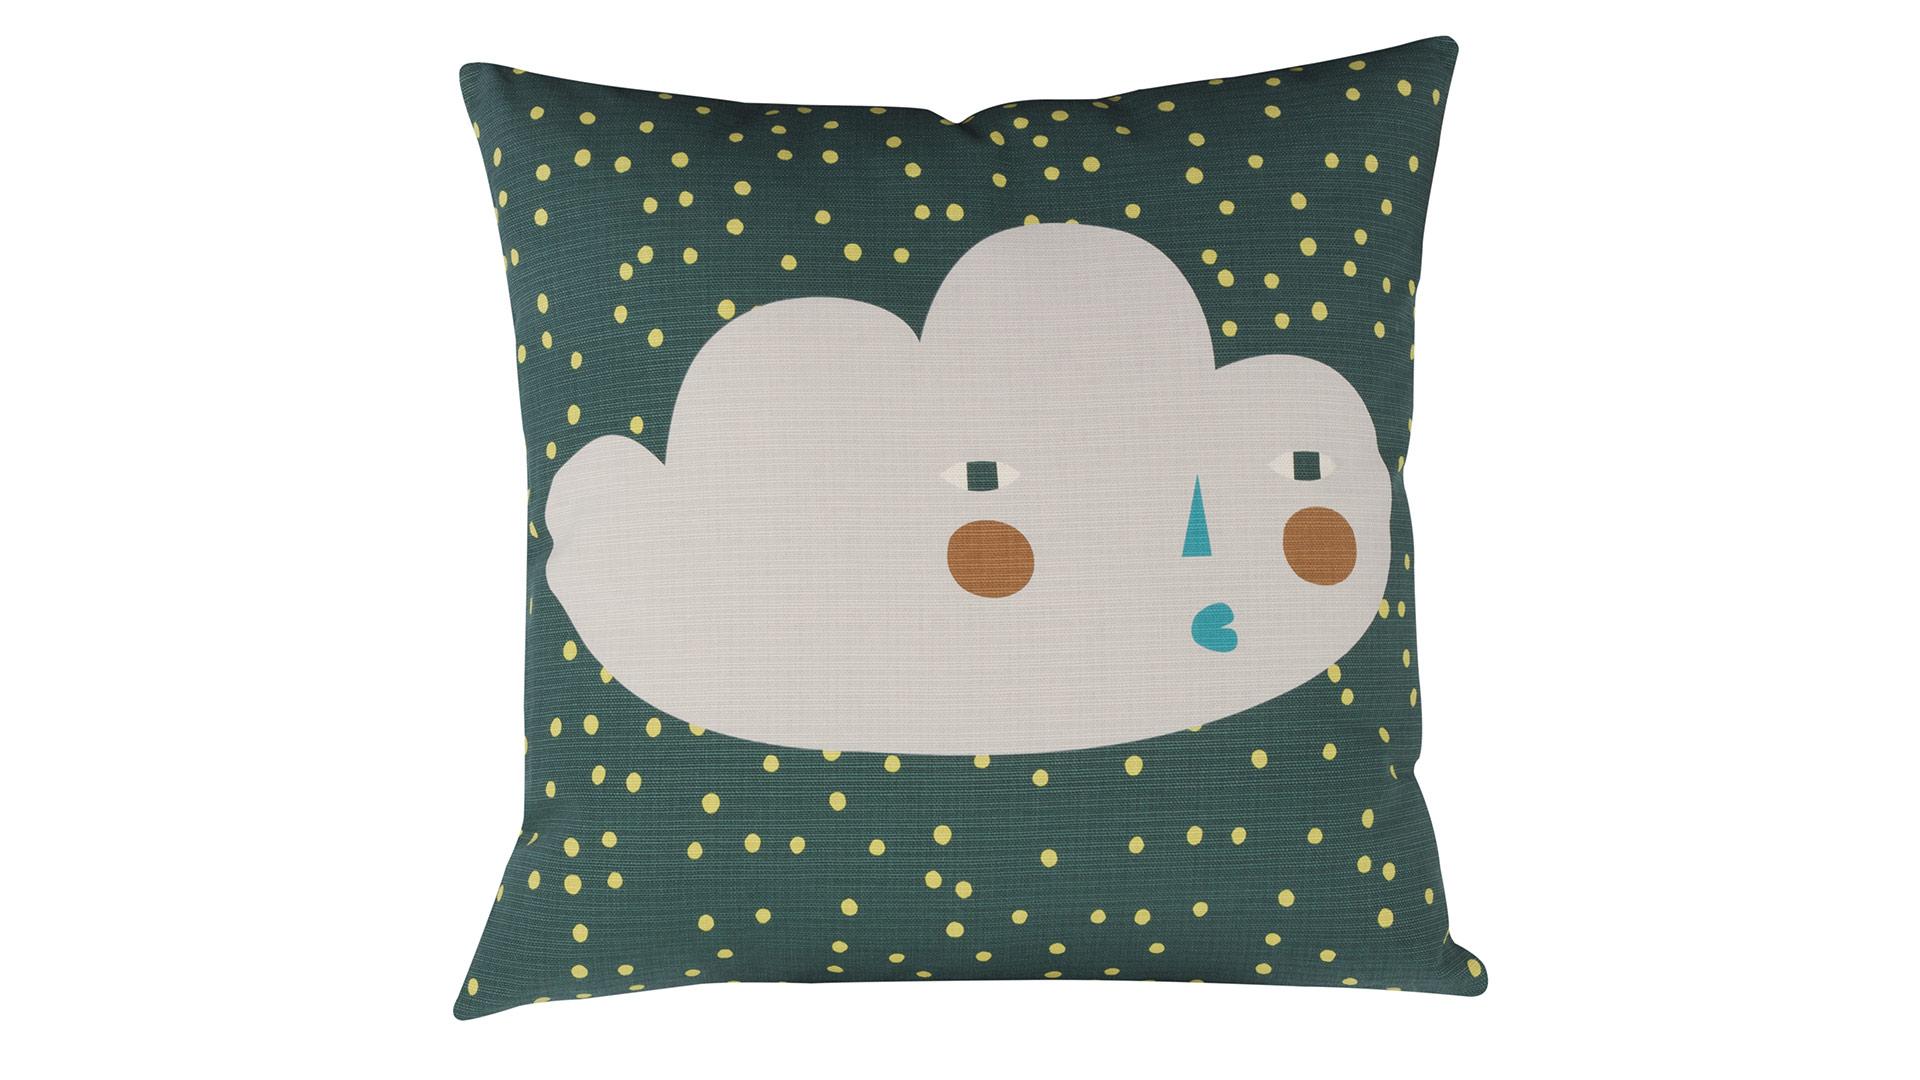 Donna-Wilson-cushion-CLOUDY-FACE